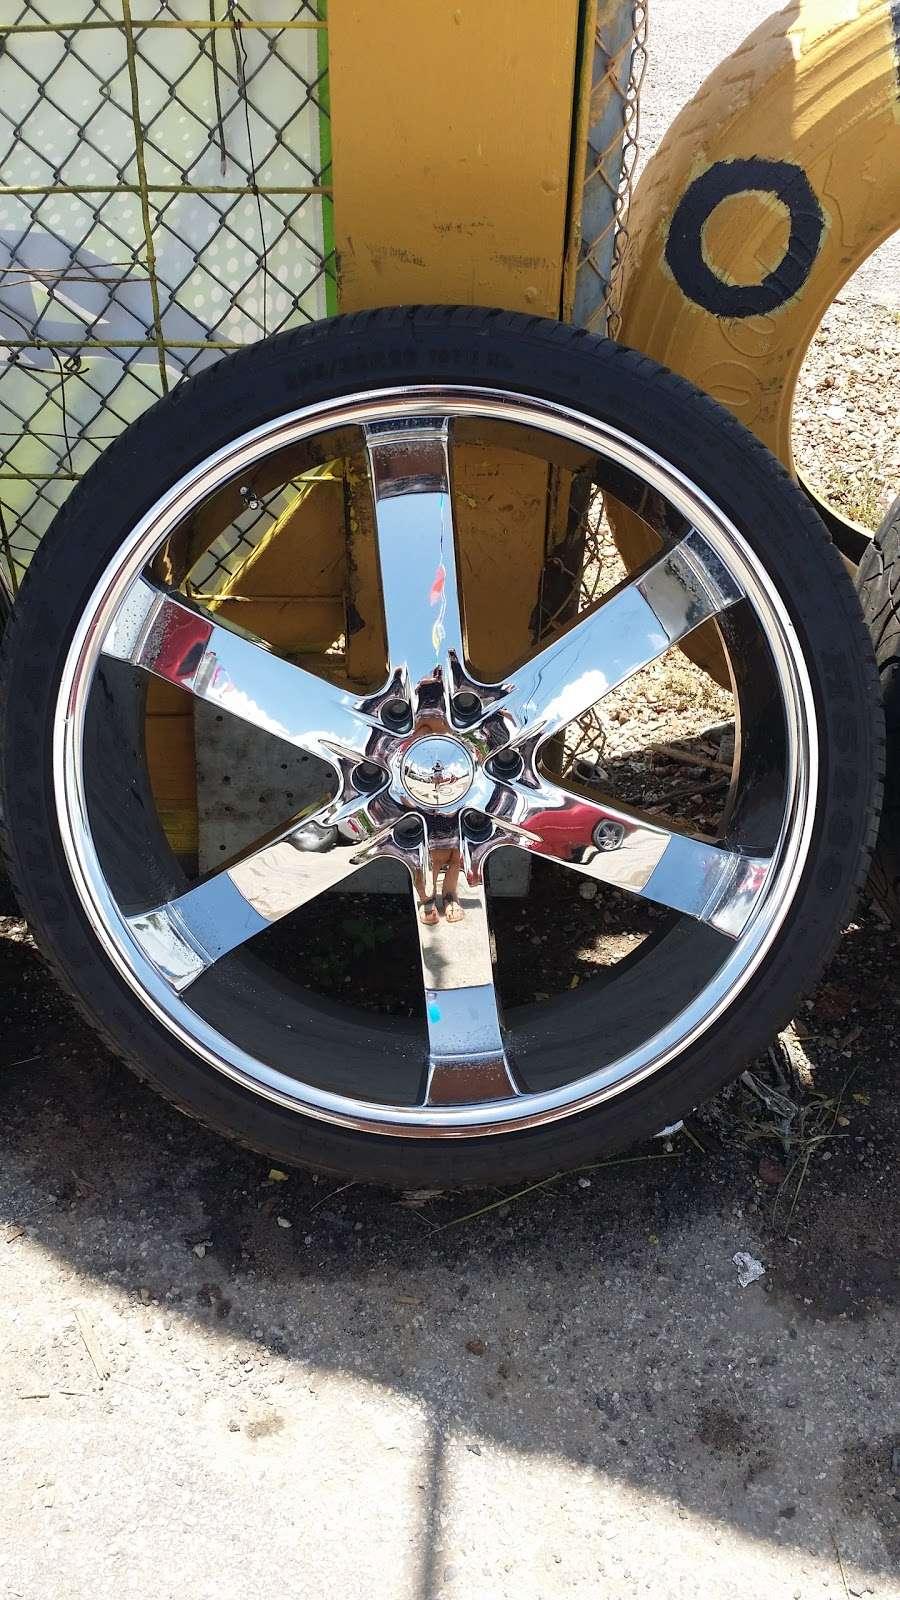 Rodriguez Tire shop - car repair  | Photo 2 of 8 | Address: 16431 FM 521 Rd, Rosharon, TX 77583, USA | Phone: (832) 894-2732